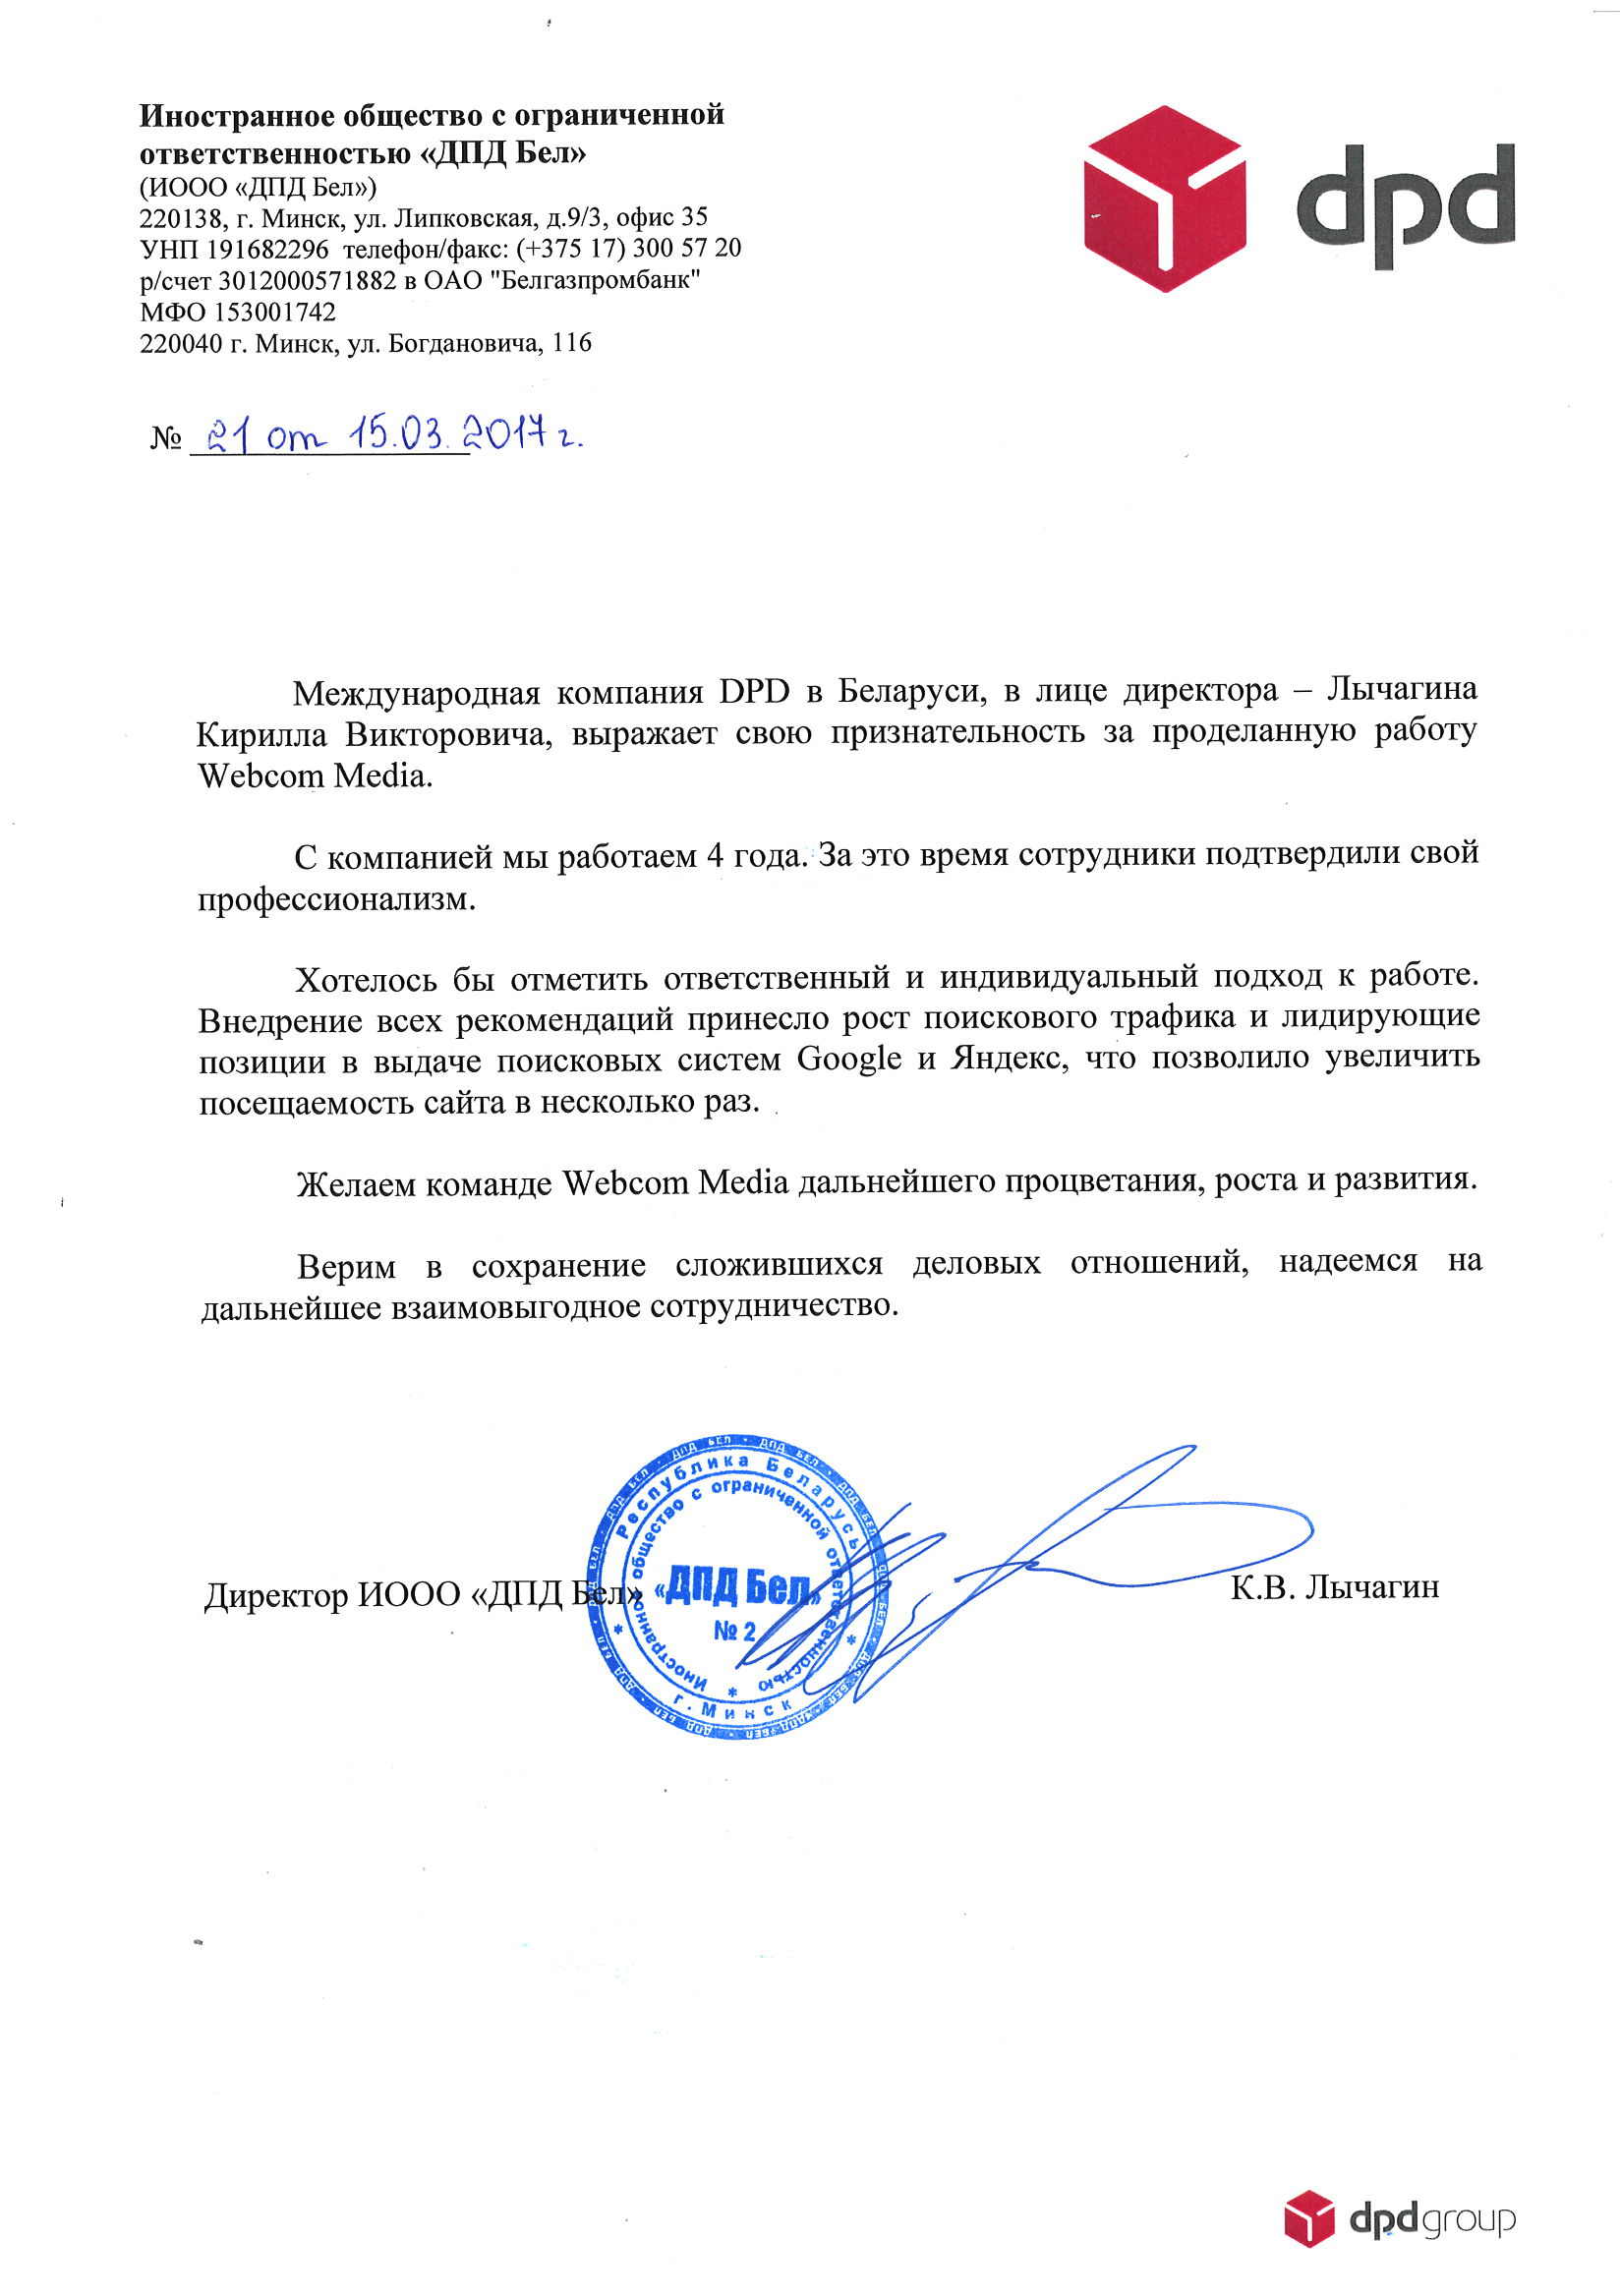 Директор ИООО 'ДПД Бел'